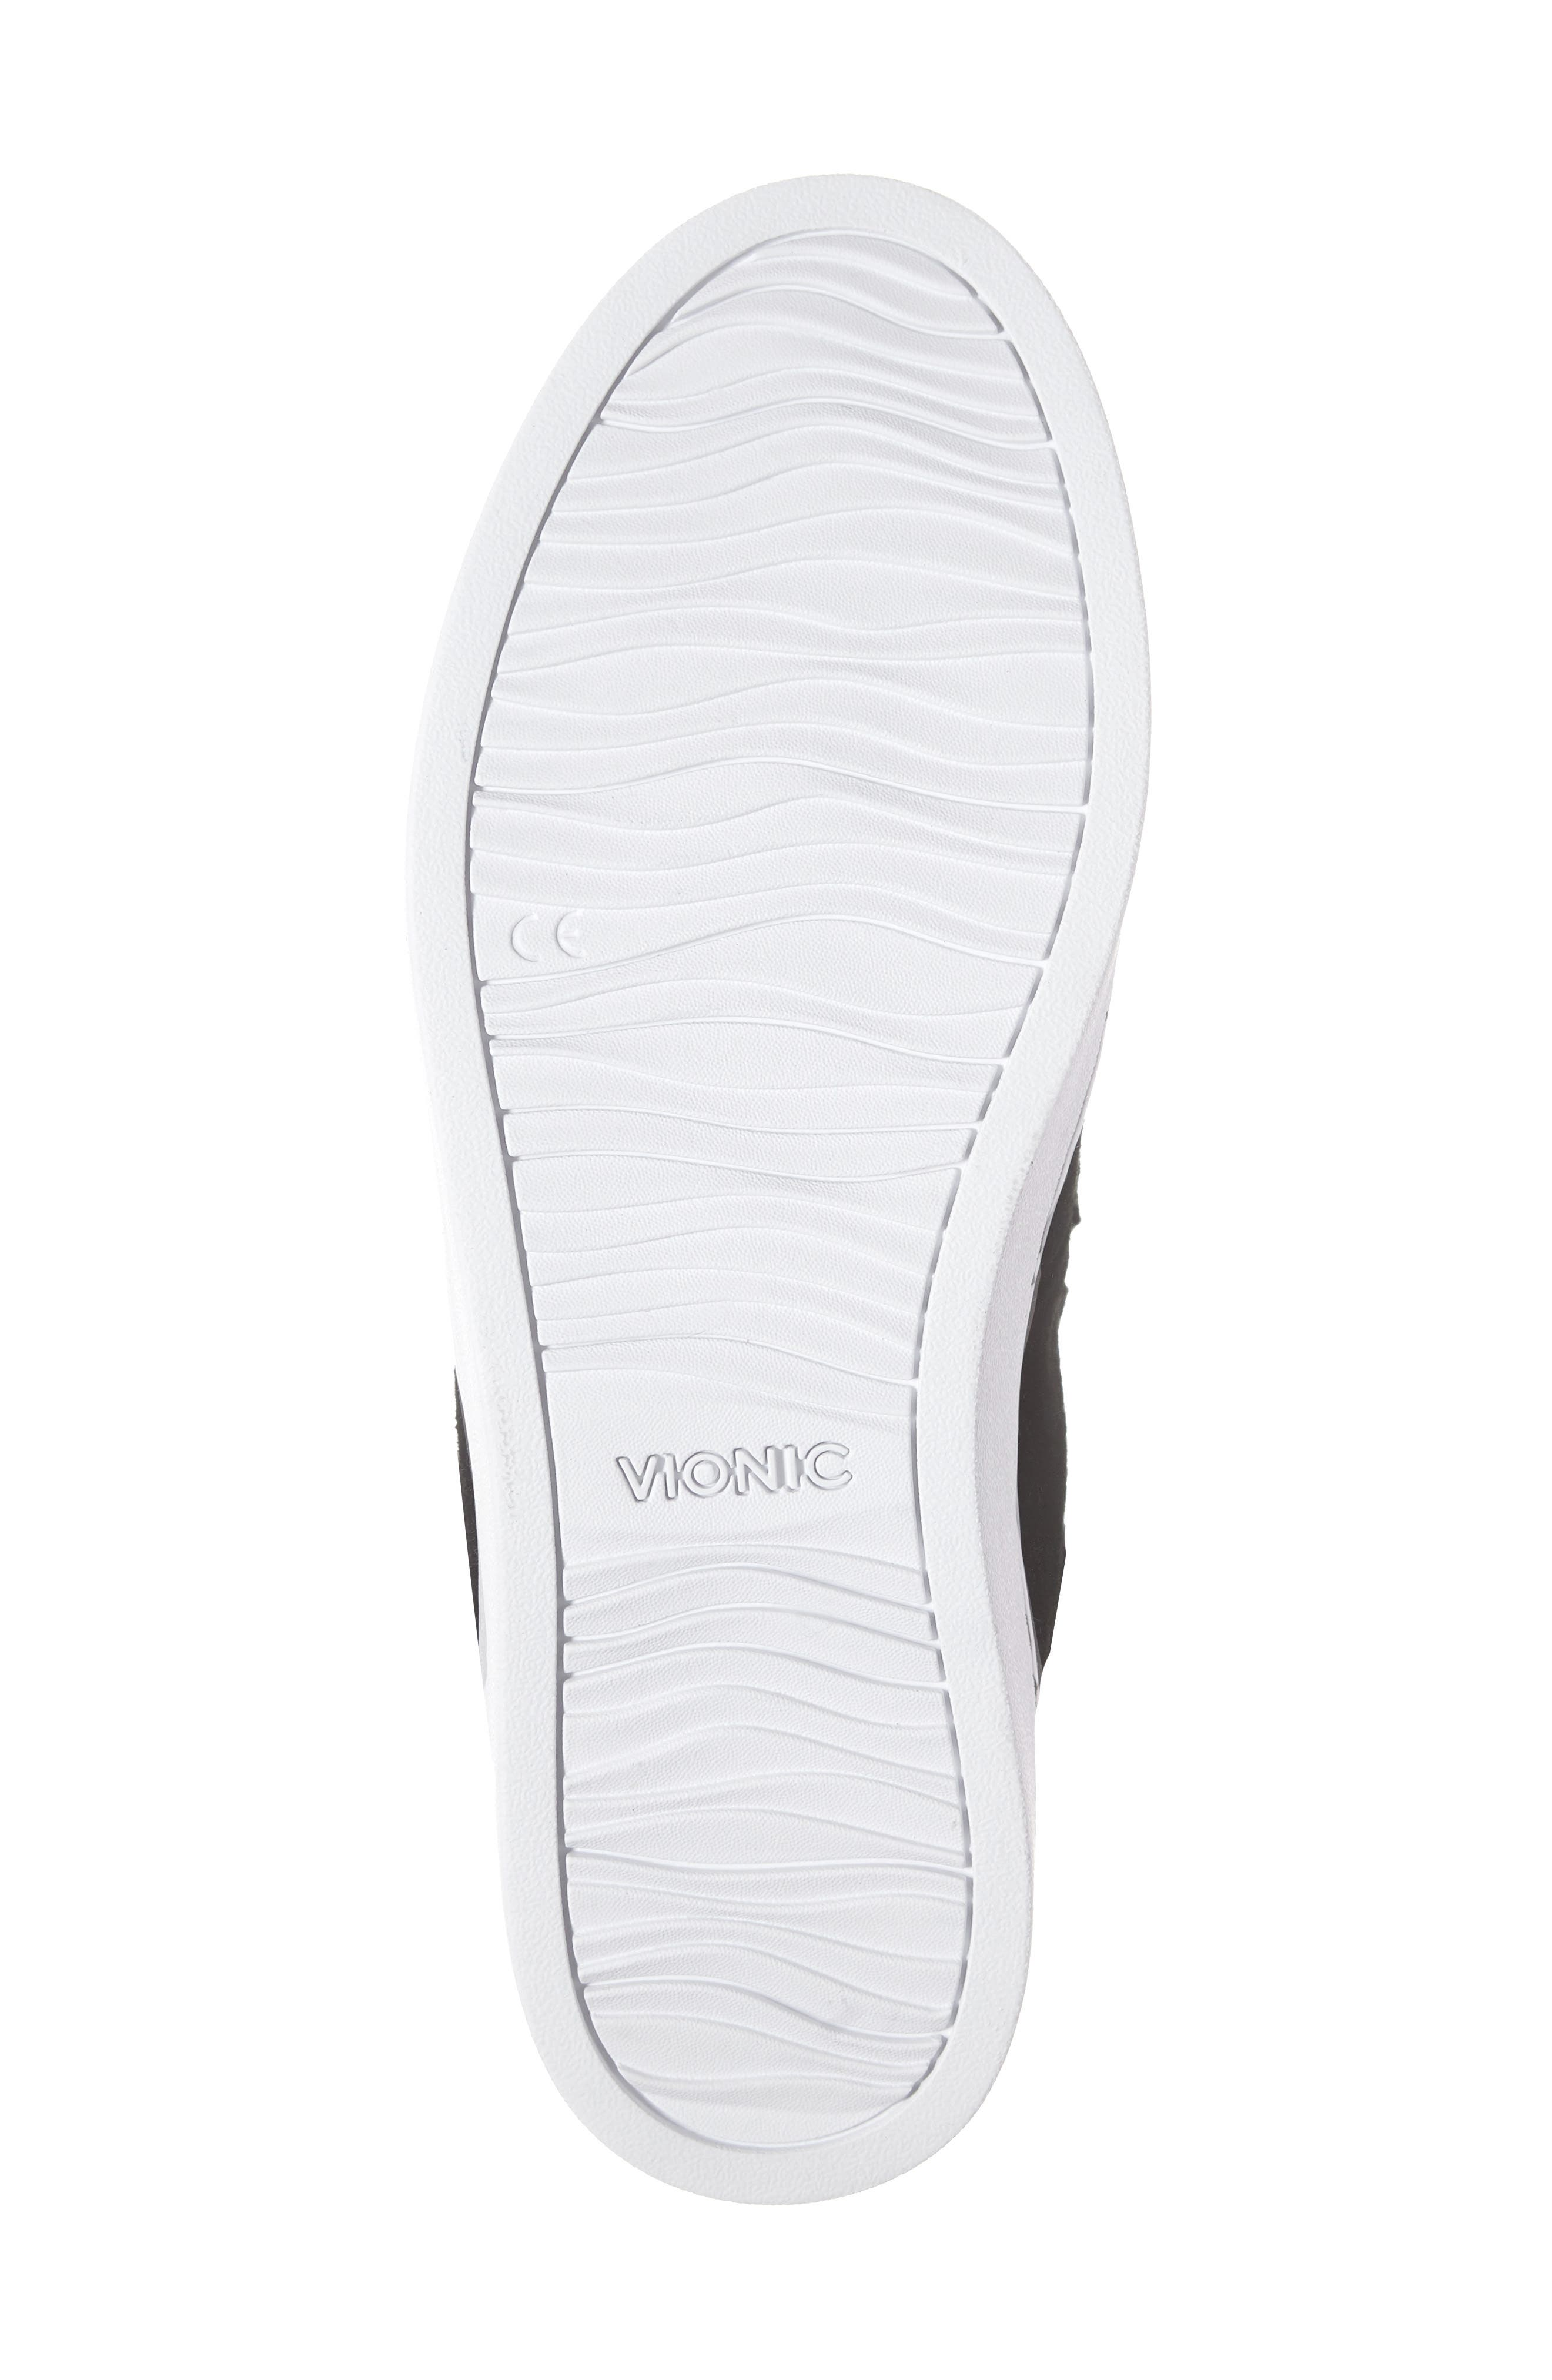 Oak Genuine Shearling Cuff Sneaker Bootie,                             Alternate thumbnail 6, color,                             BLACK SUEDE